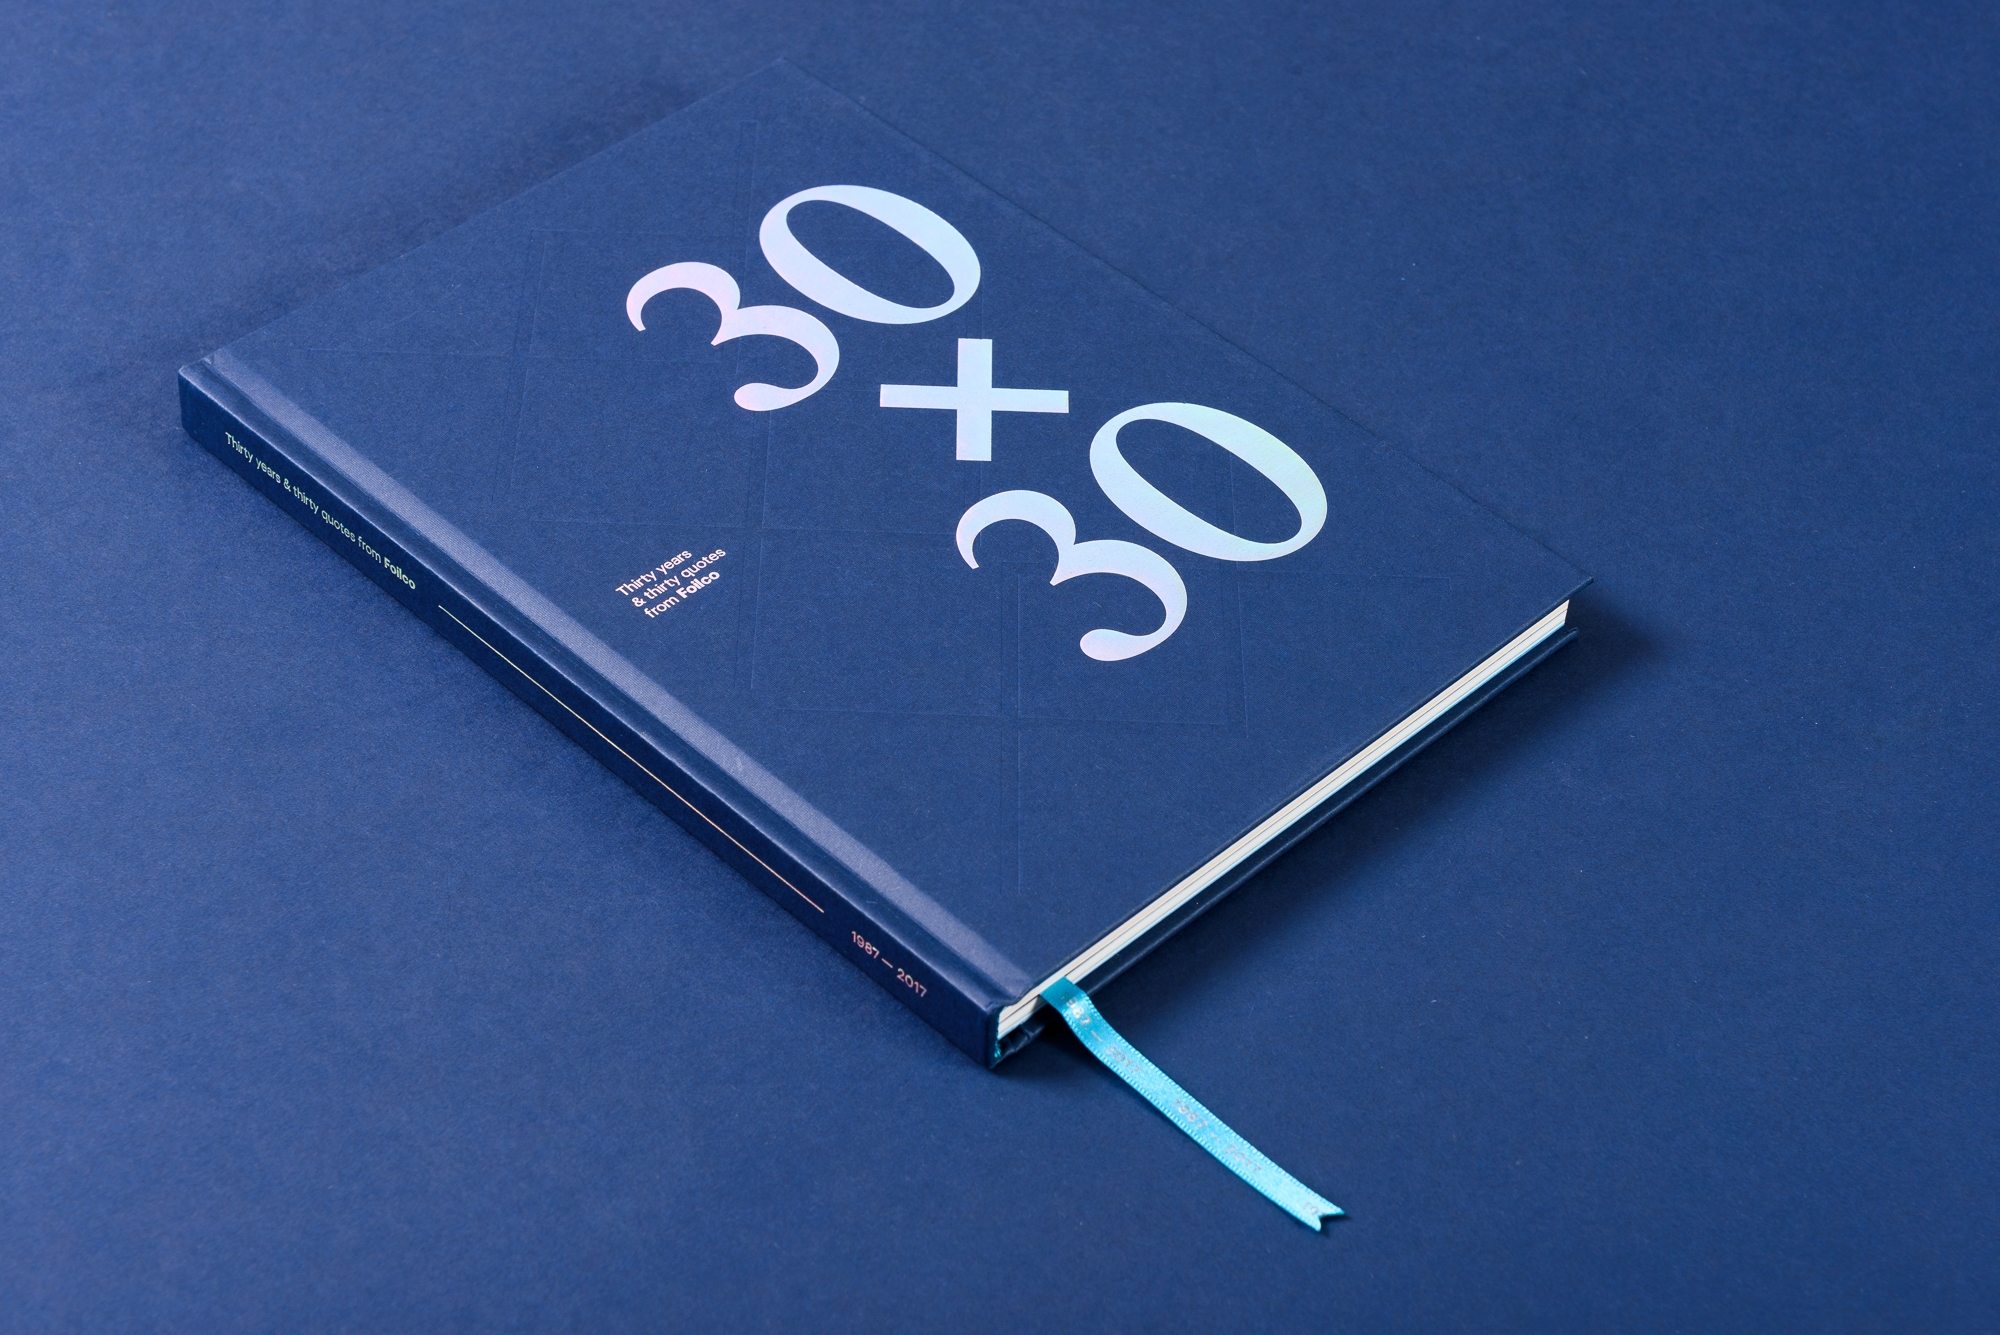 Foilco 30x30 book